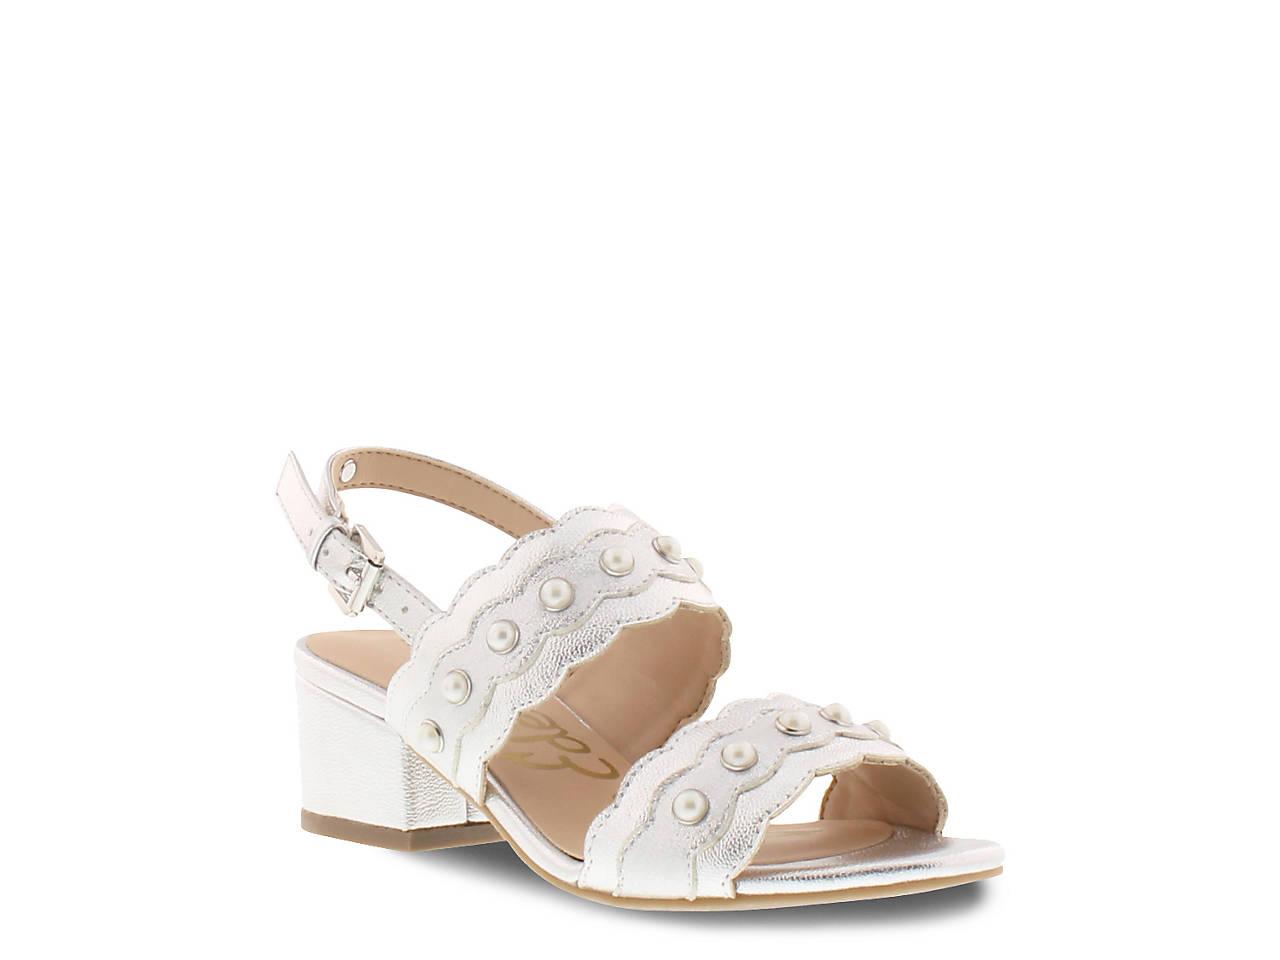 640e9f318 Sam Edelman Yvette Coral Toddler   Youth Sandal Kids Shoes